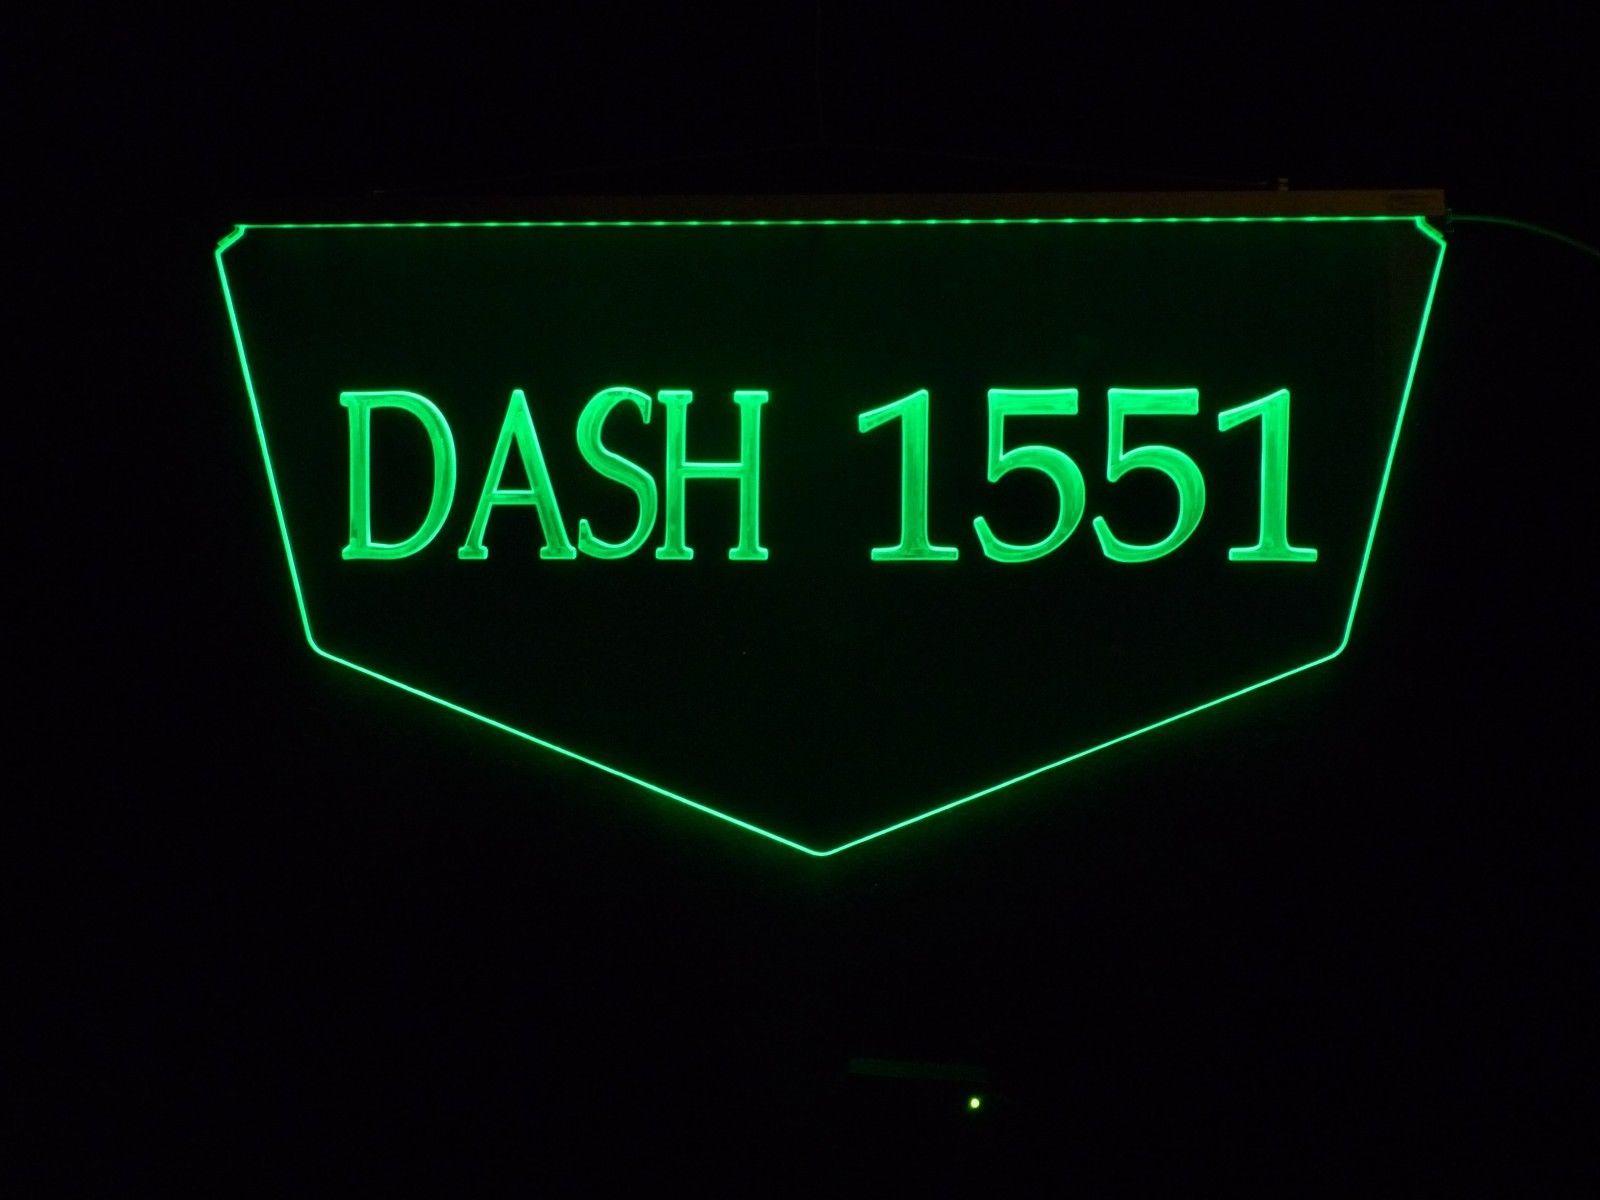 Personalized Custom Lighted Street Address LED Window Sign image 4